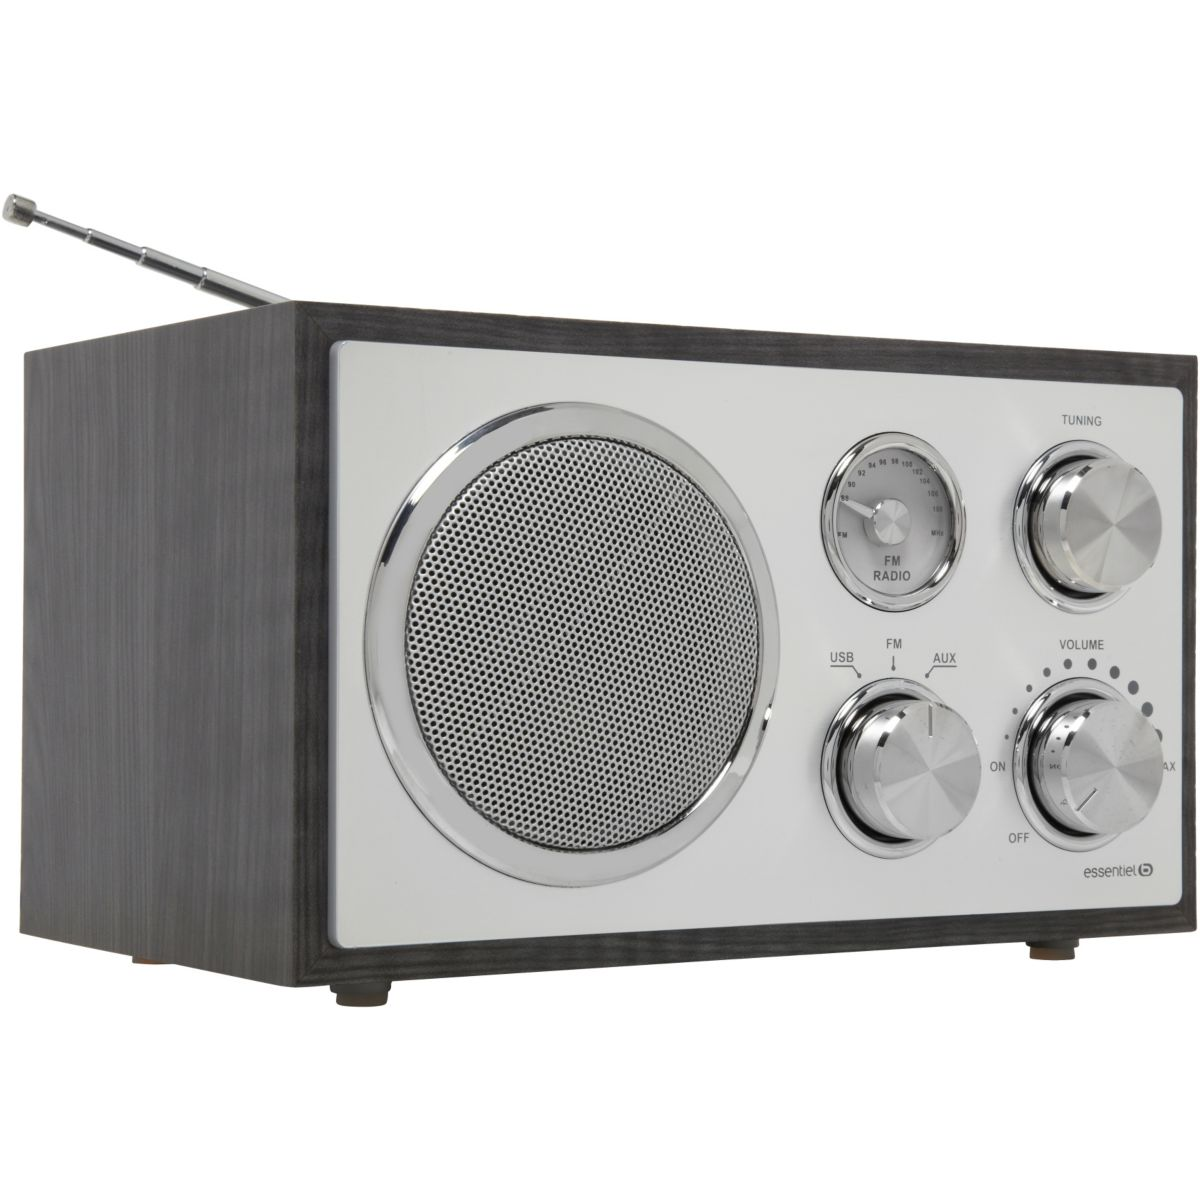 Radio analogique ESSENTIELB Madera USB Noir